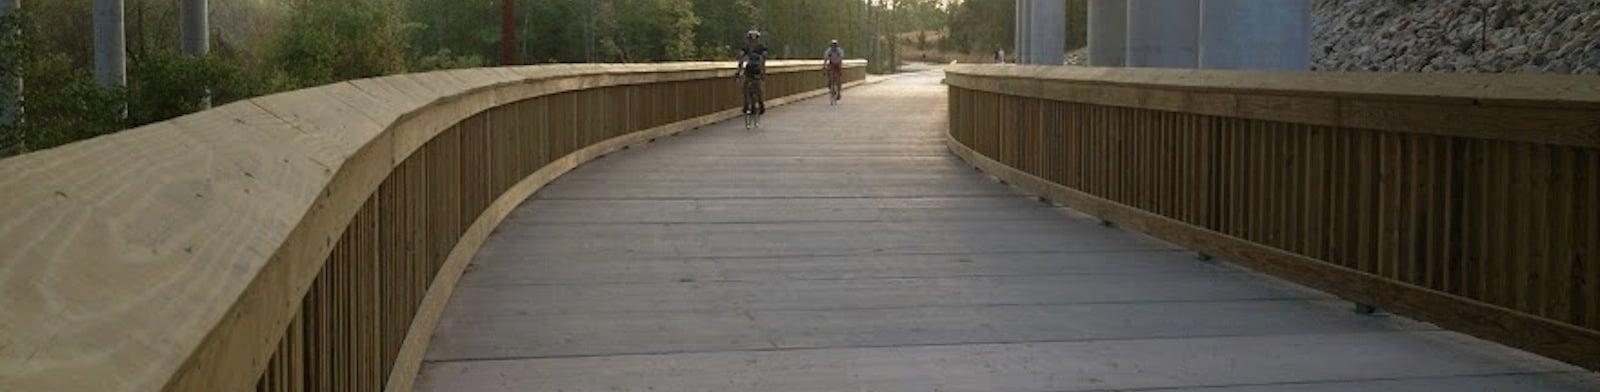 Glastonbury_Multi_Use_Path_Cyclists.jpg